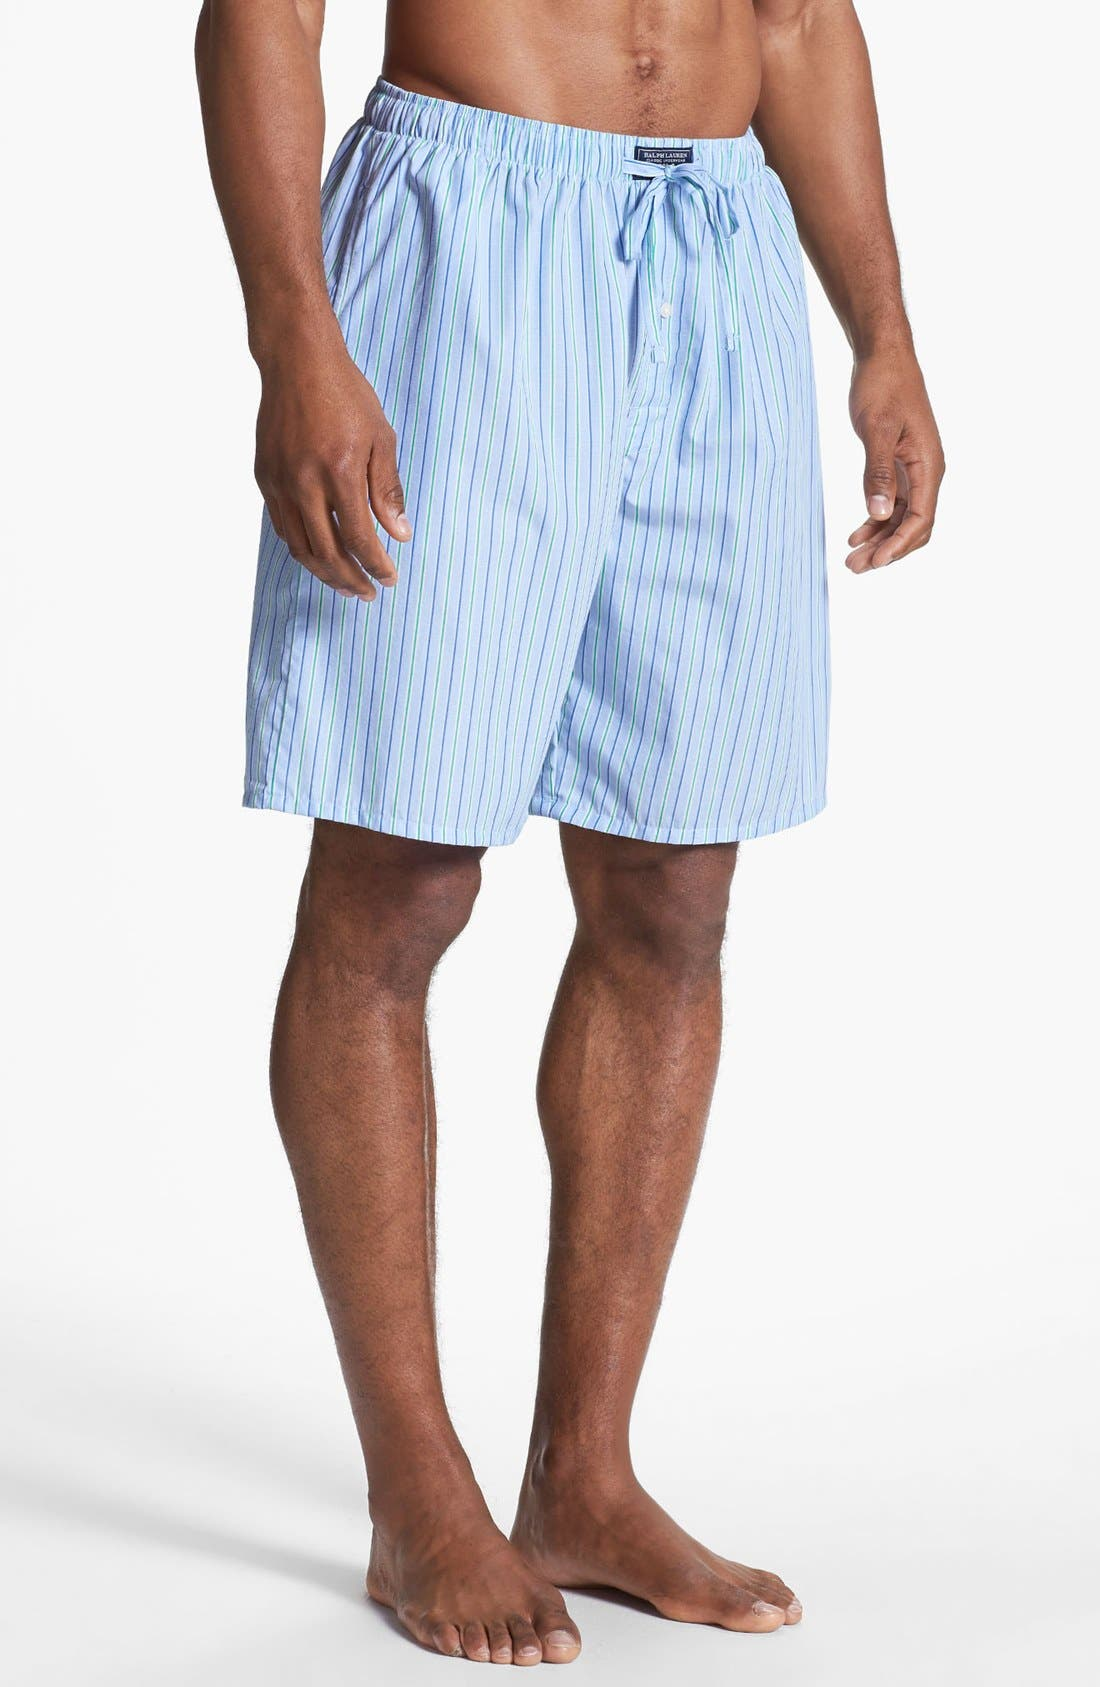 Alternate Image 1 Selected - Polo Ralph Lauren Cotton Pajama Shorts